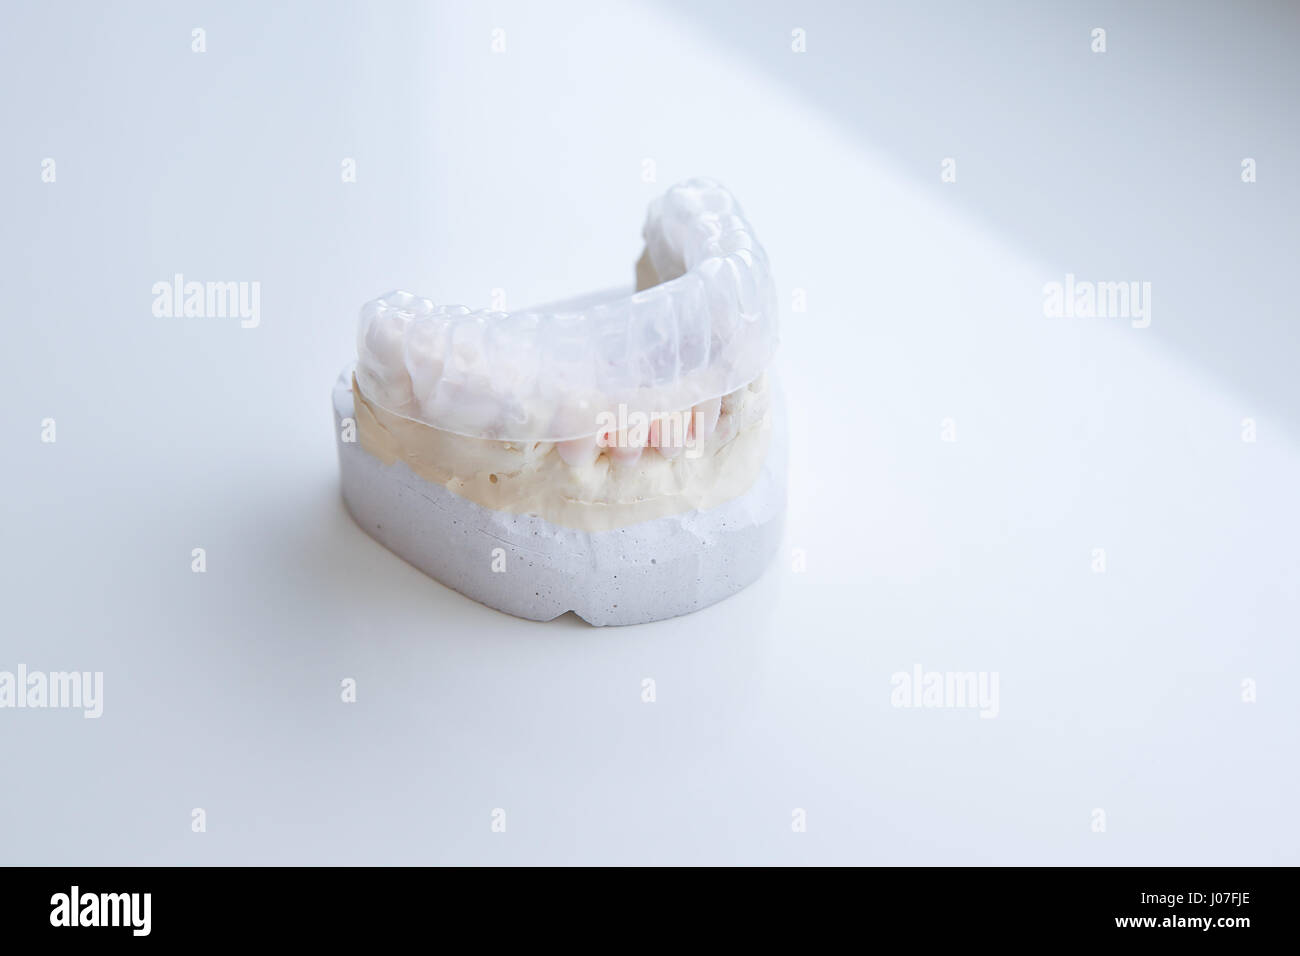 Invisalign, invisible plastic teeth aligner on a dental plaster mold Stock Photo